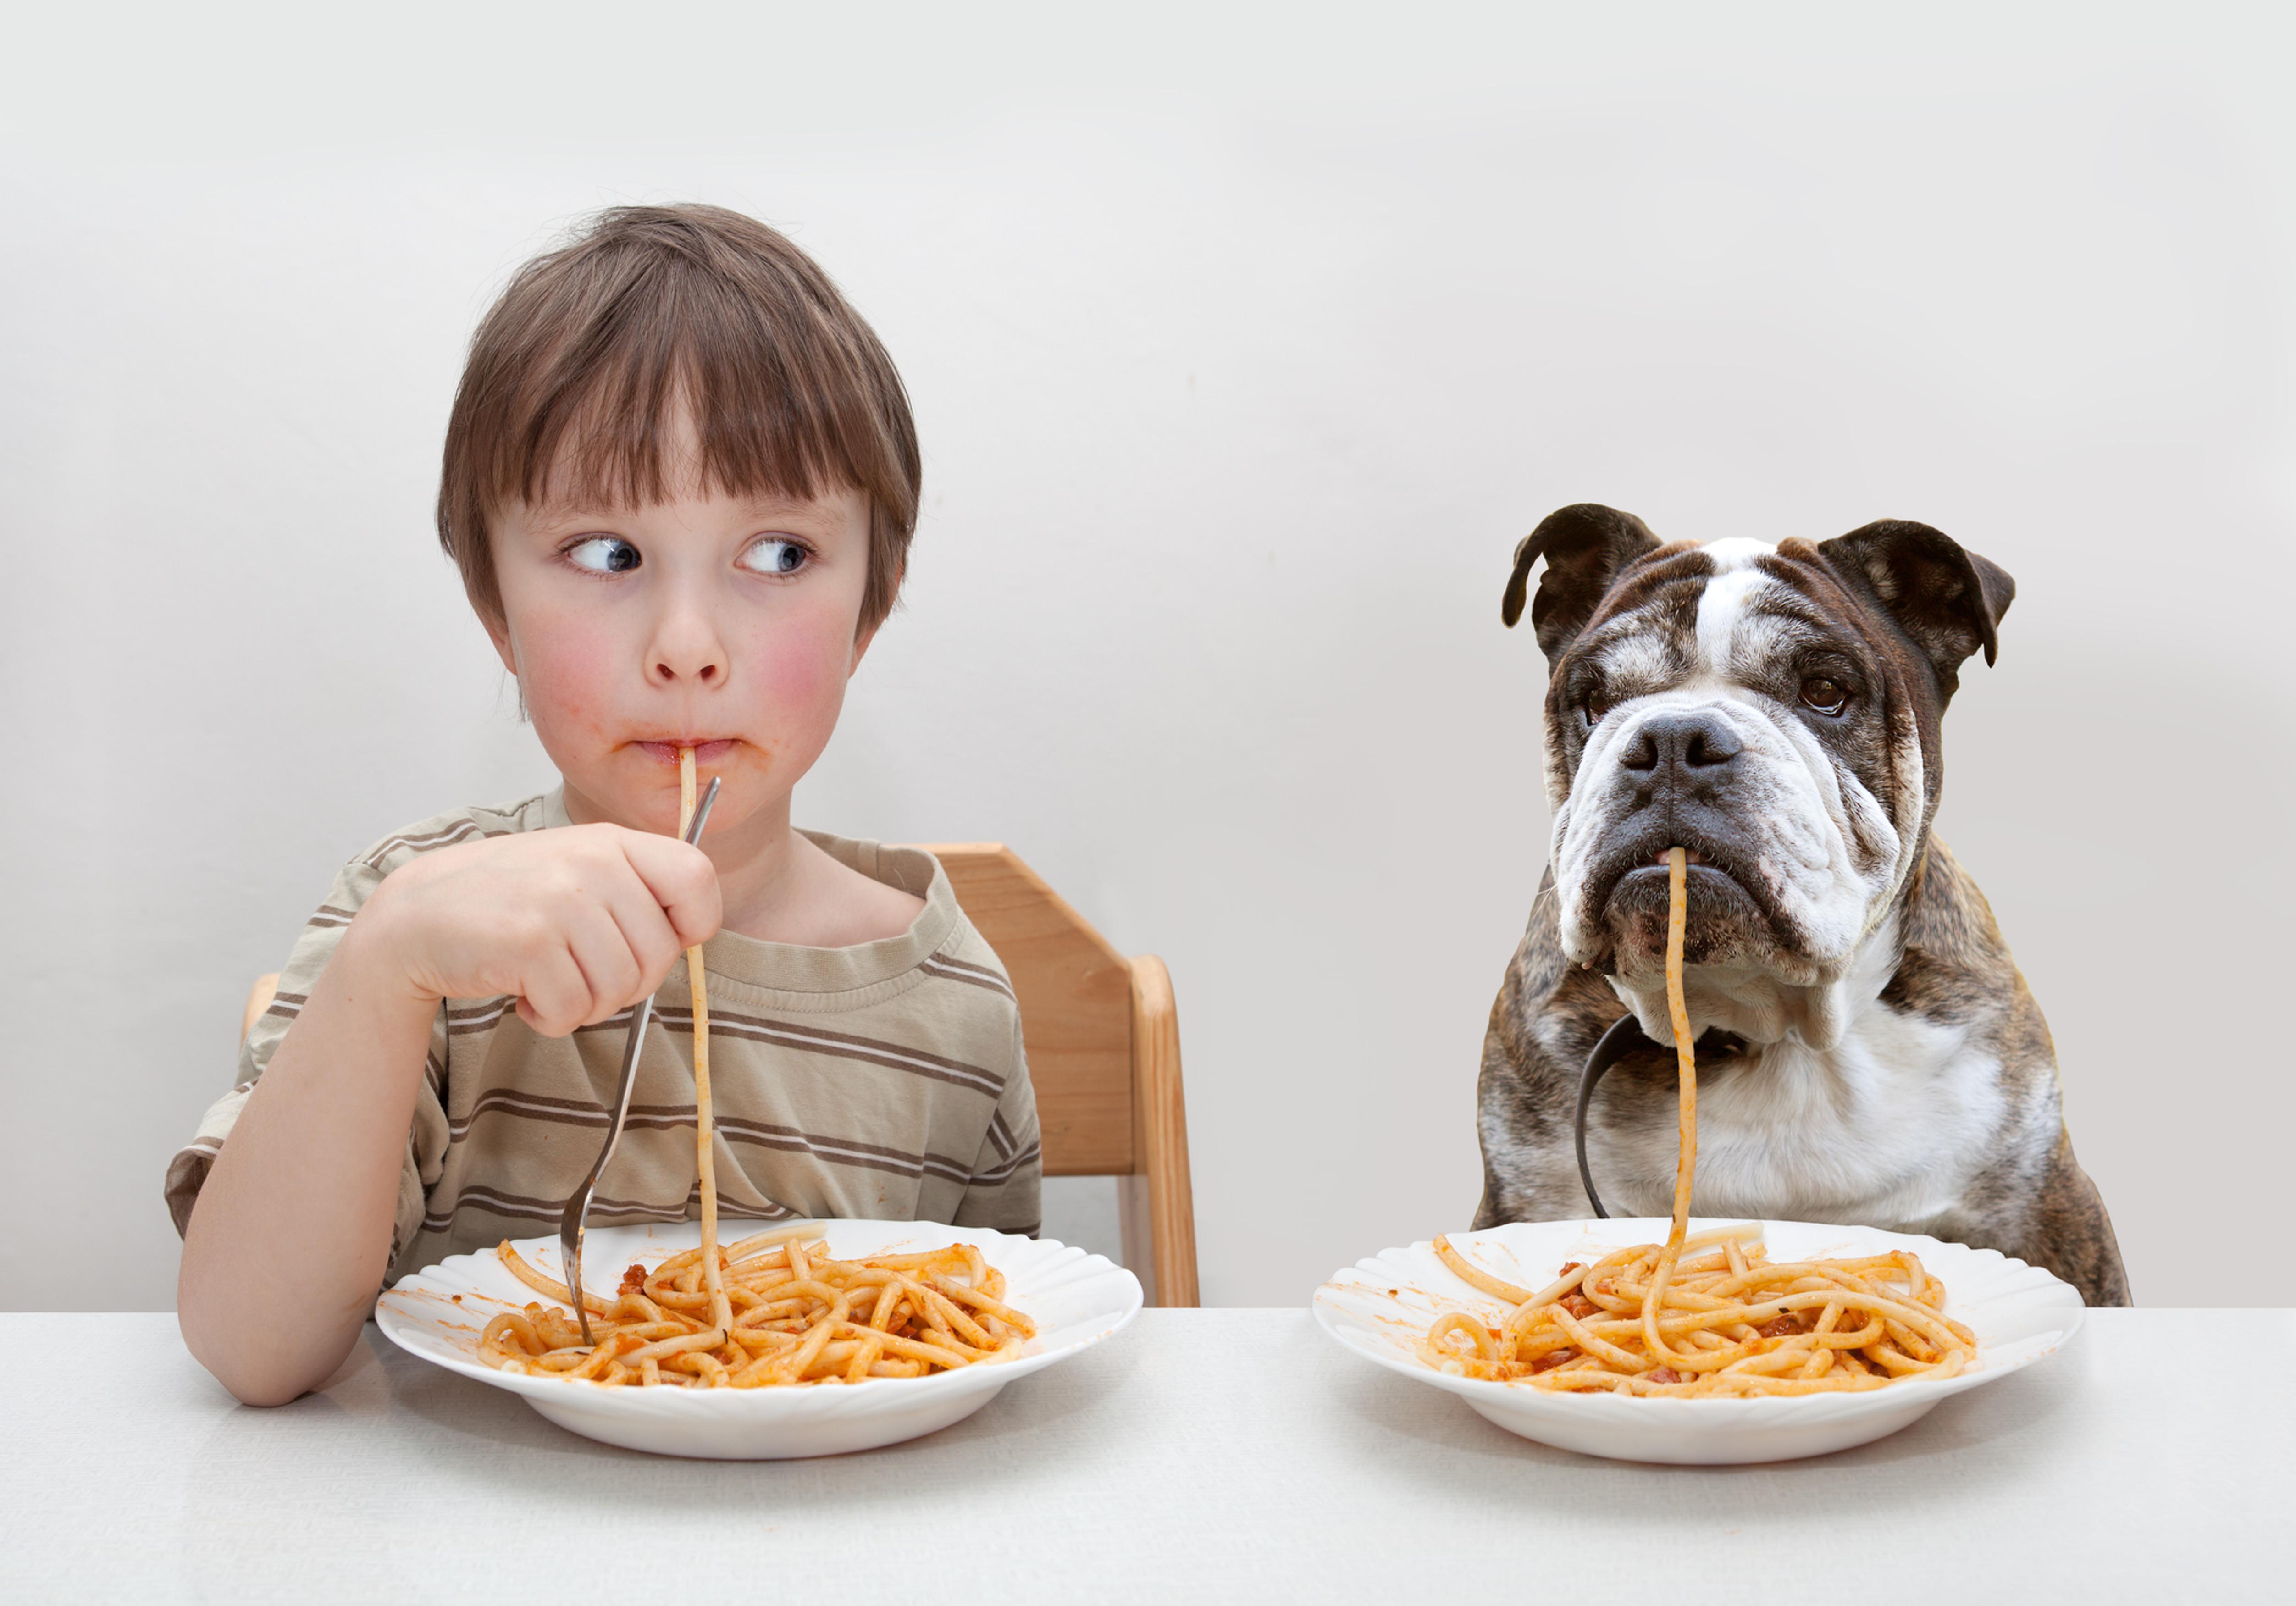 Kind- Hund Beziehung